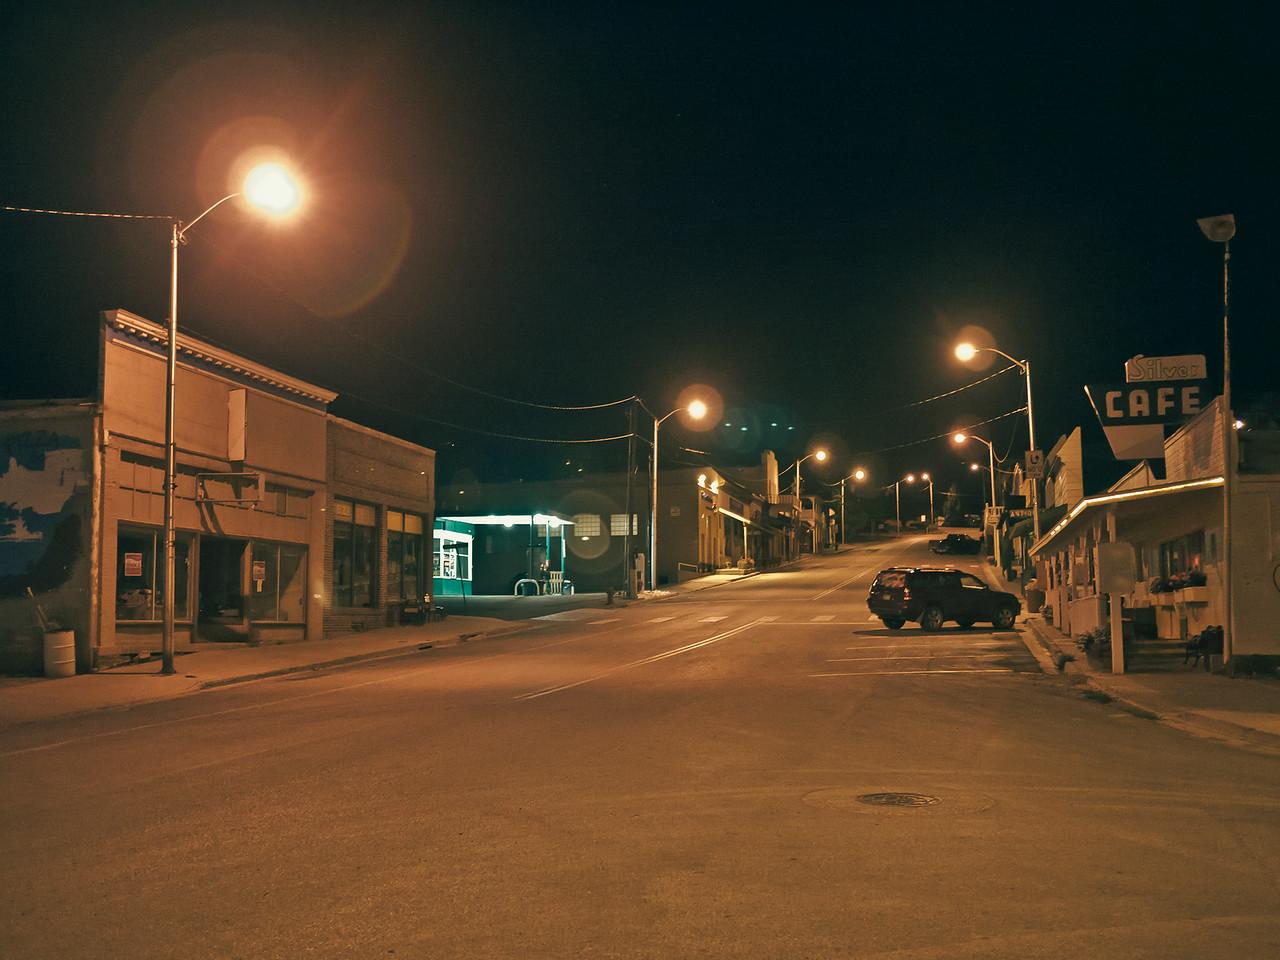 Downtown Pioche, Nevada